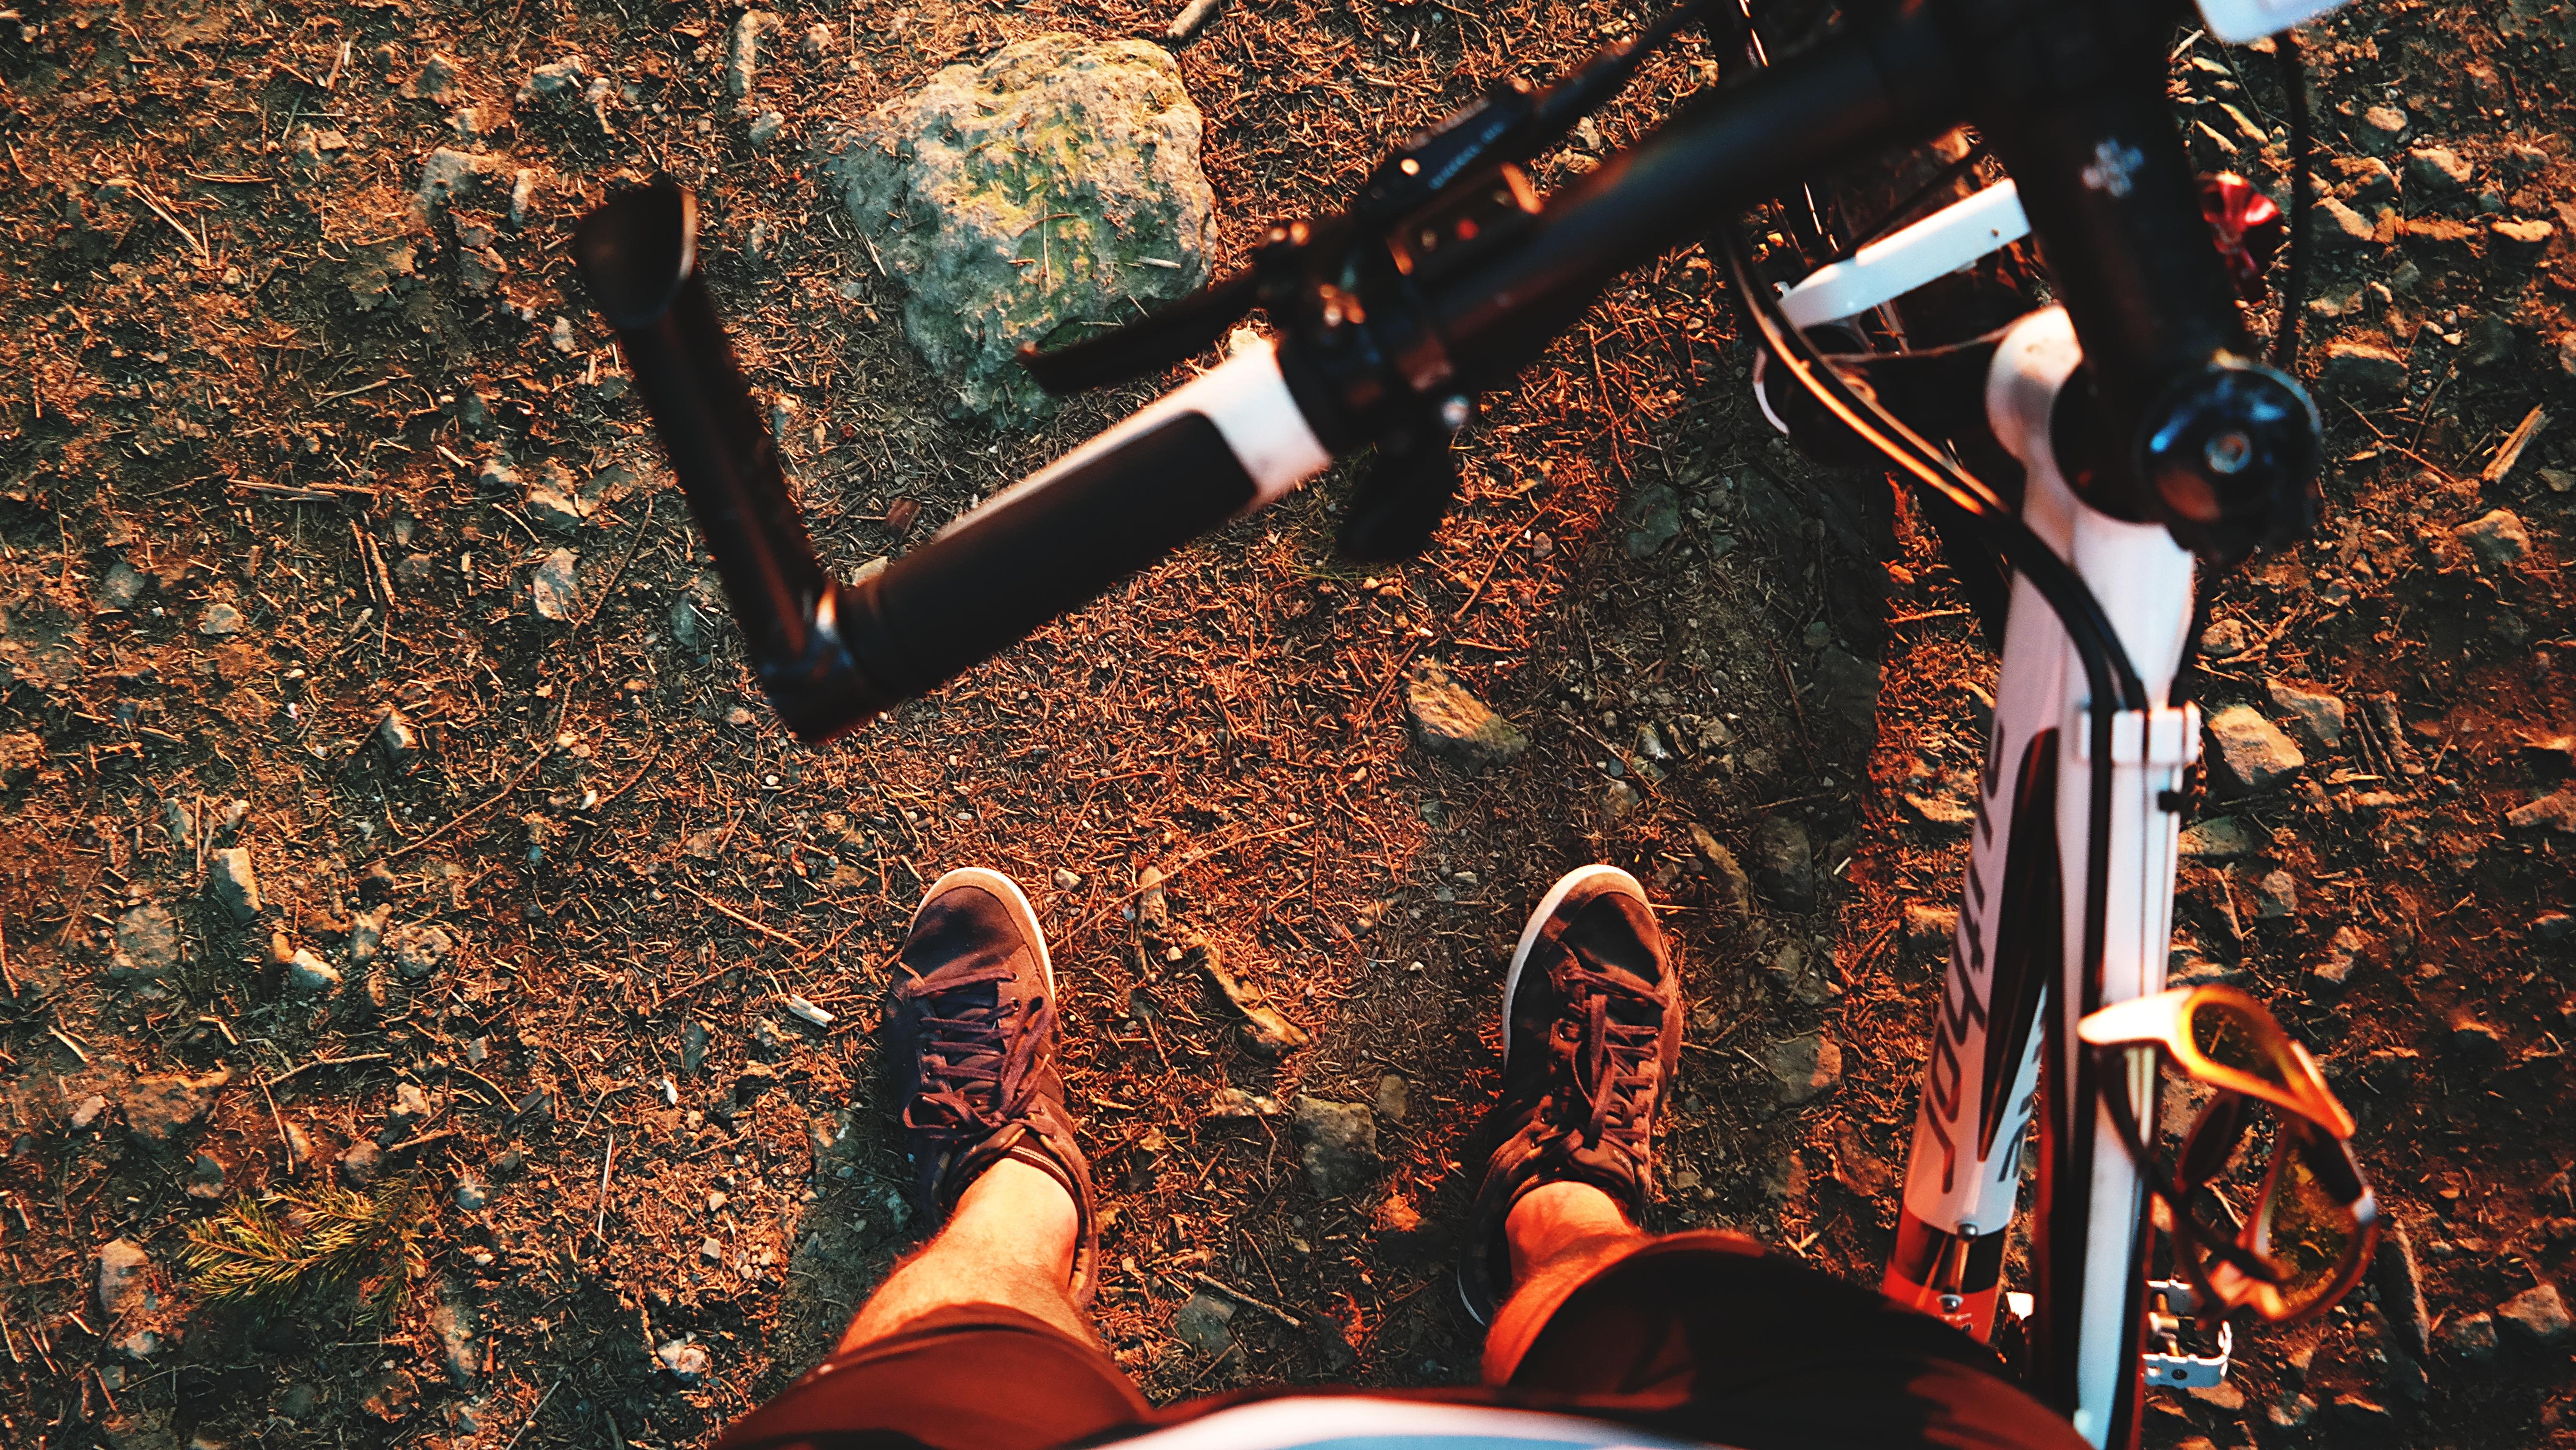 Gambar Olahraga Bulat Musim Panas Perjalanan